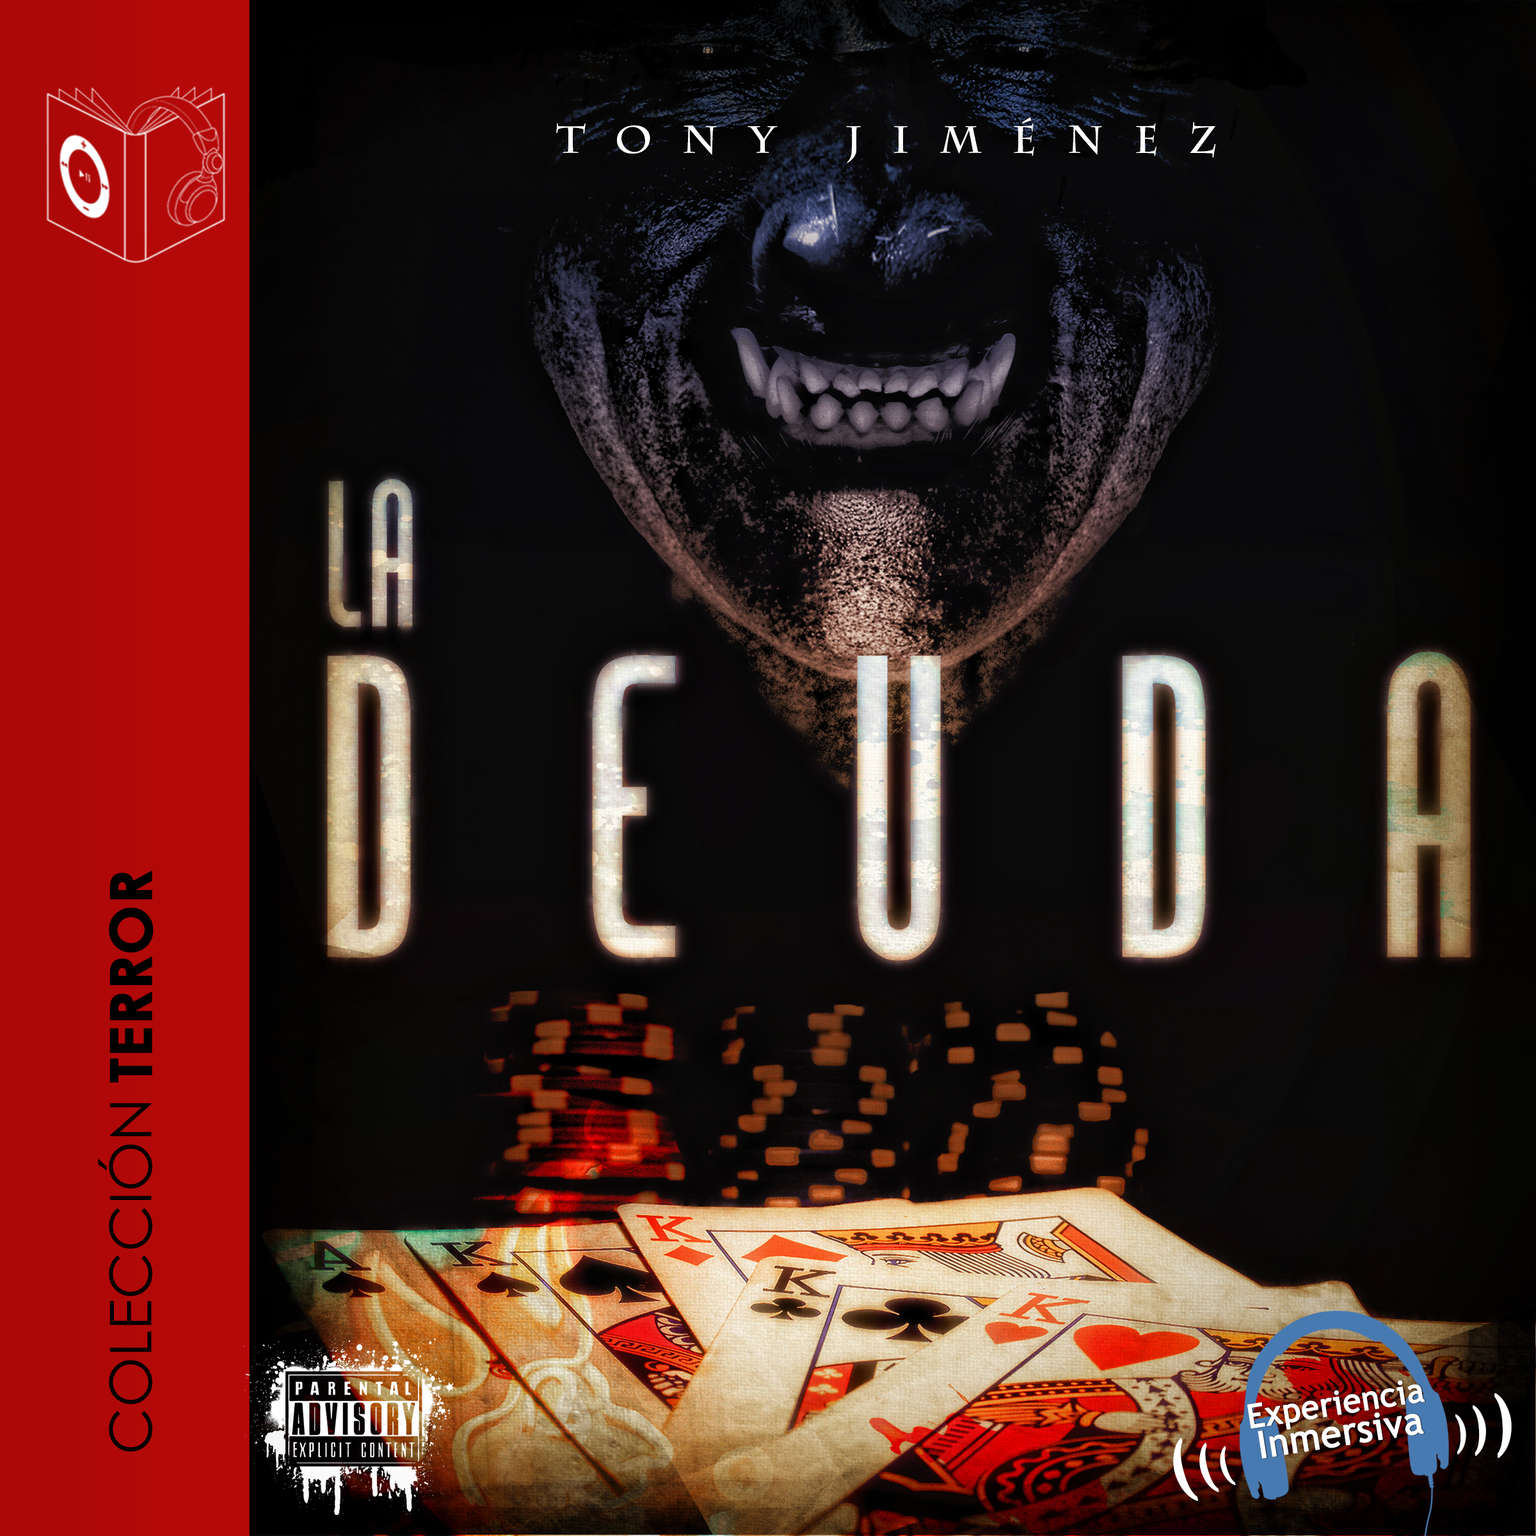 La deuda Audiobook, by Tony Jimenez